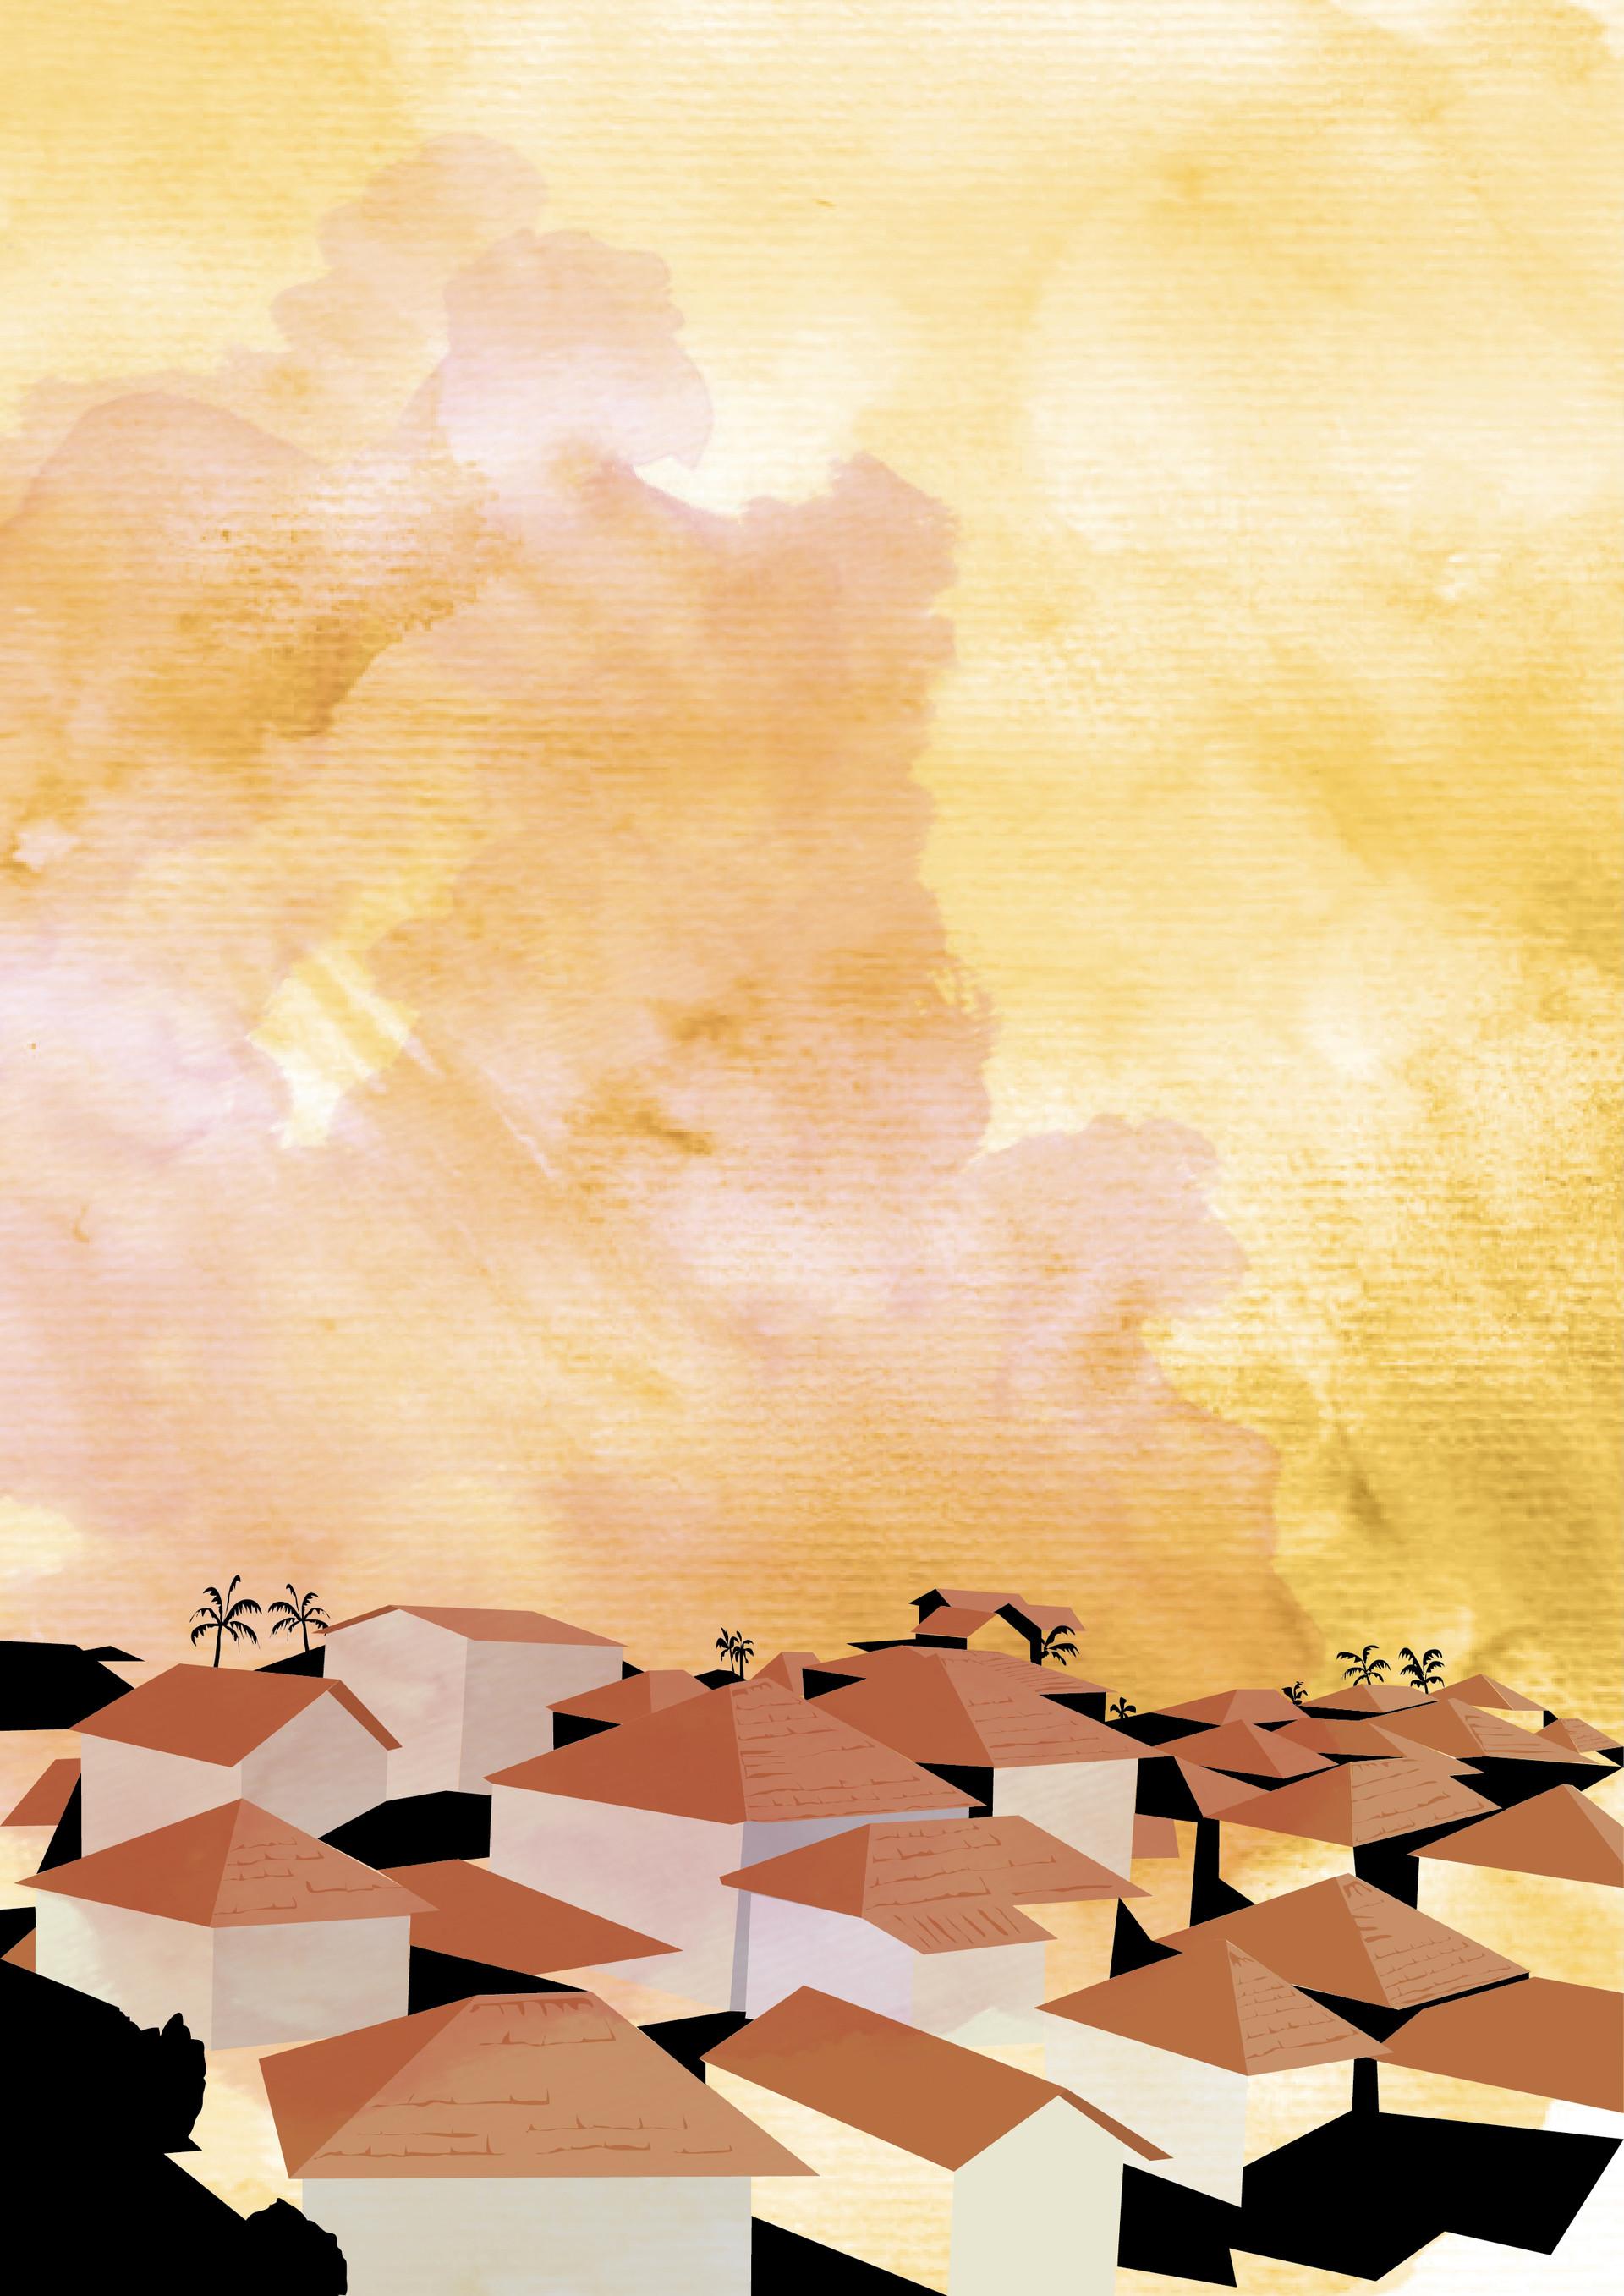 Rajesh r sawant konkan roof tops 2 01